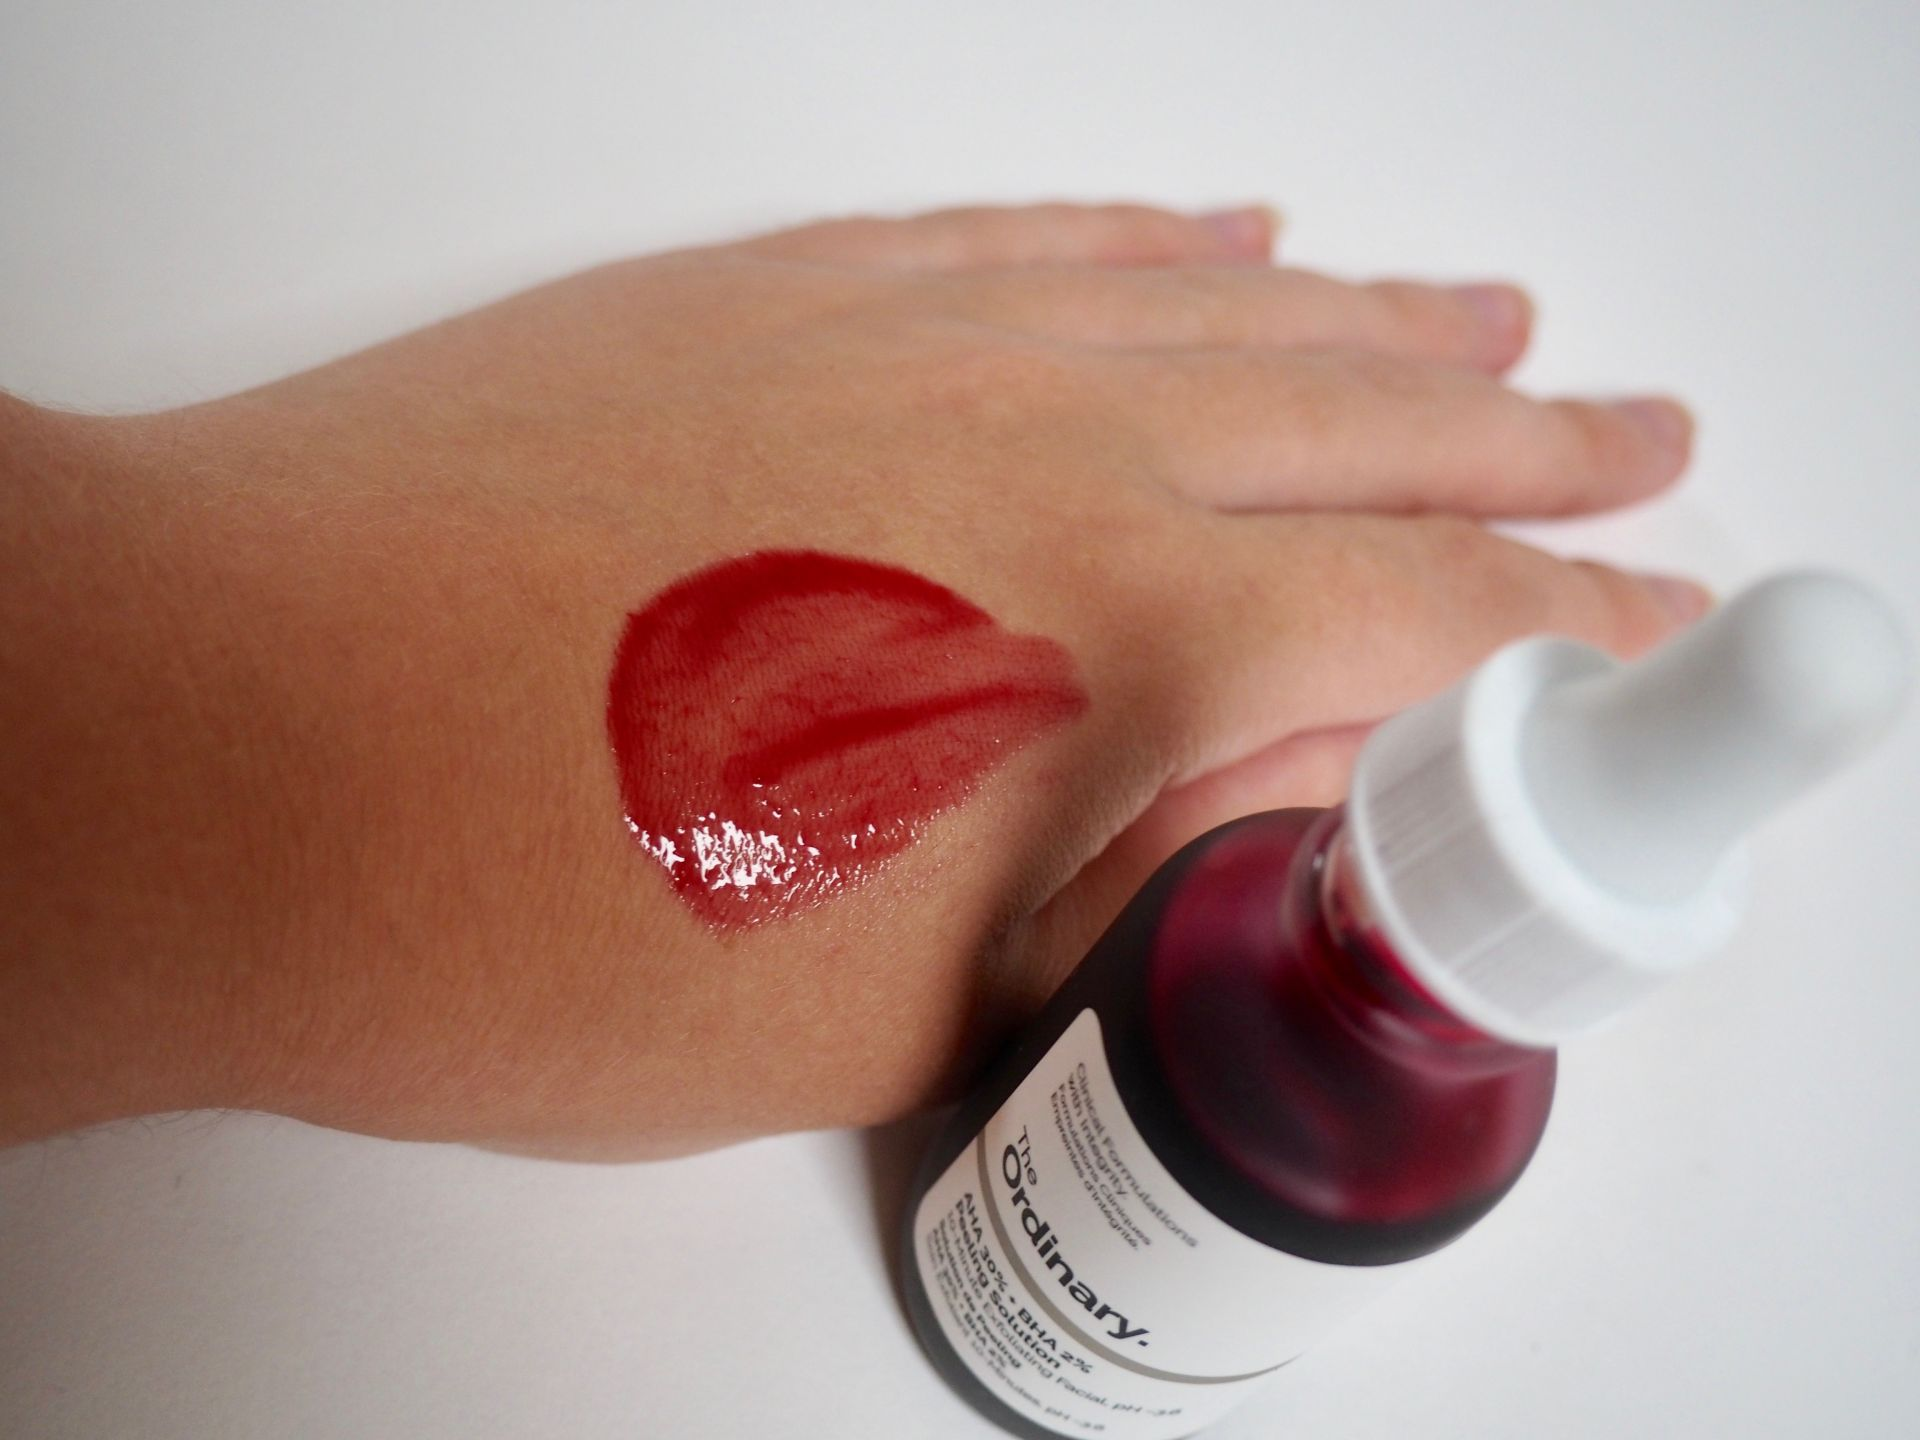 The ordinary AHA 30% + BHA 2% Peeling Solution.